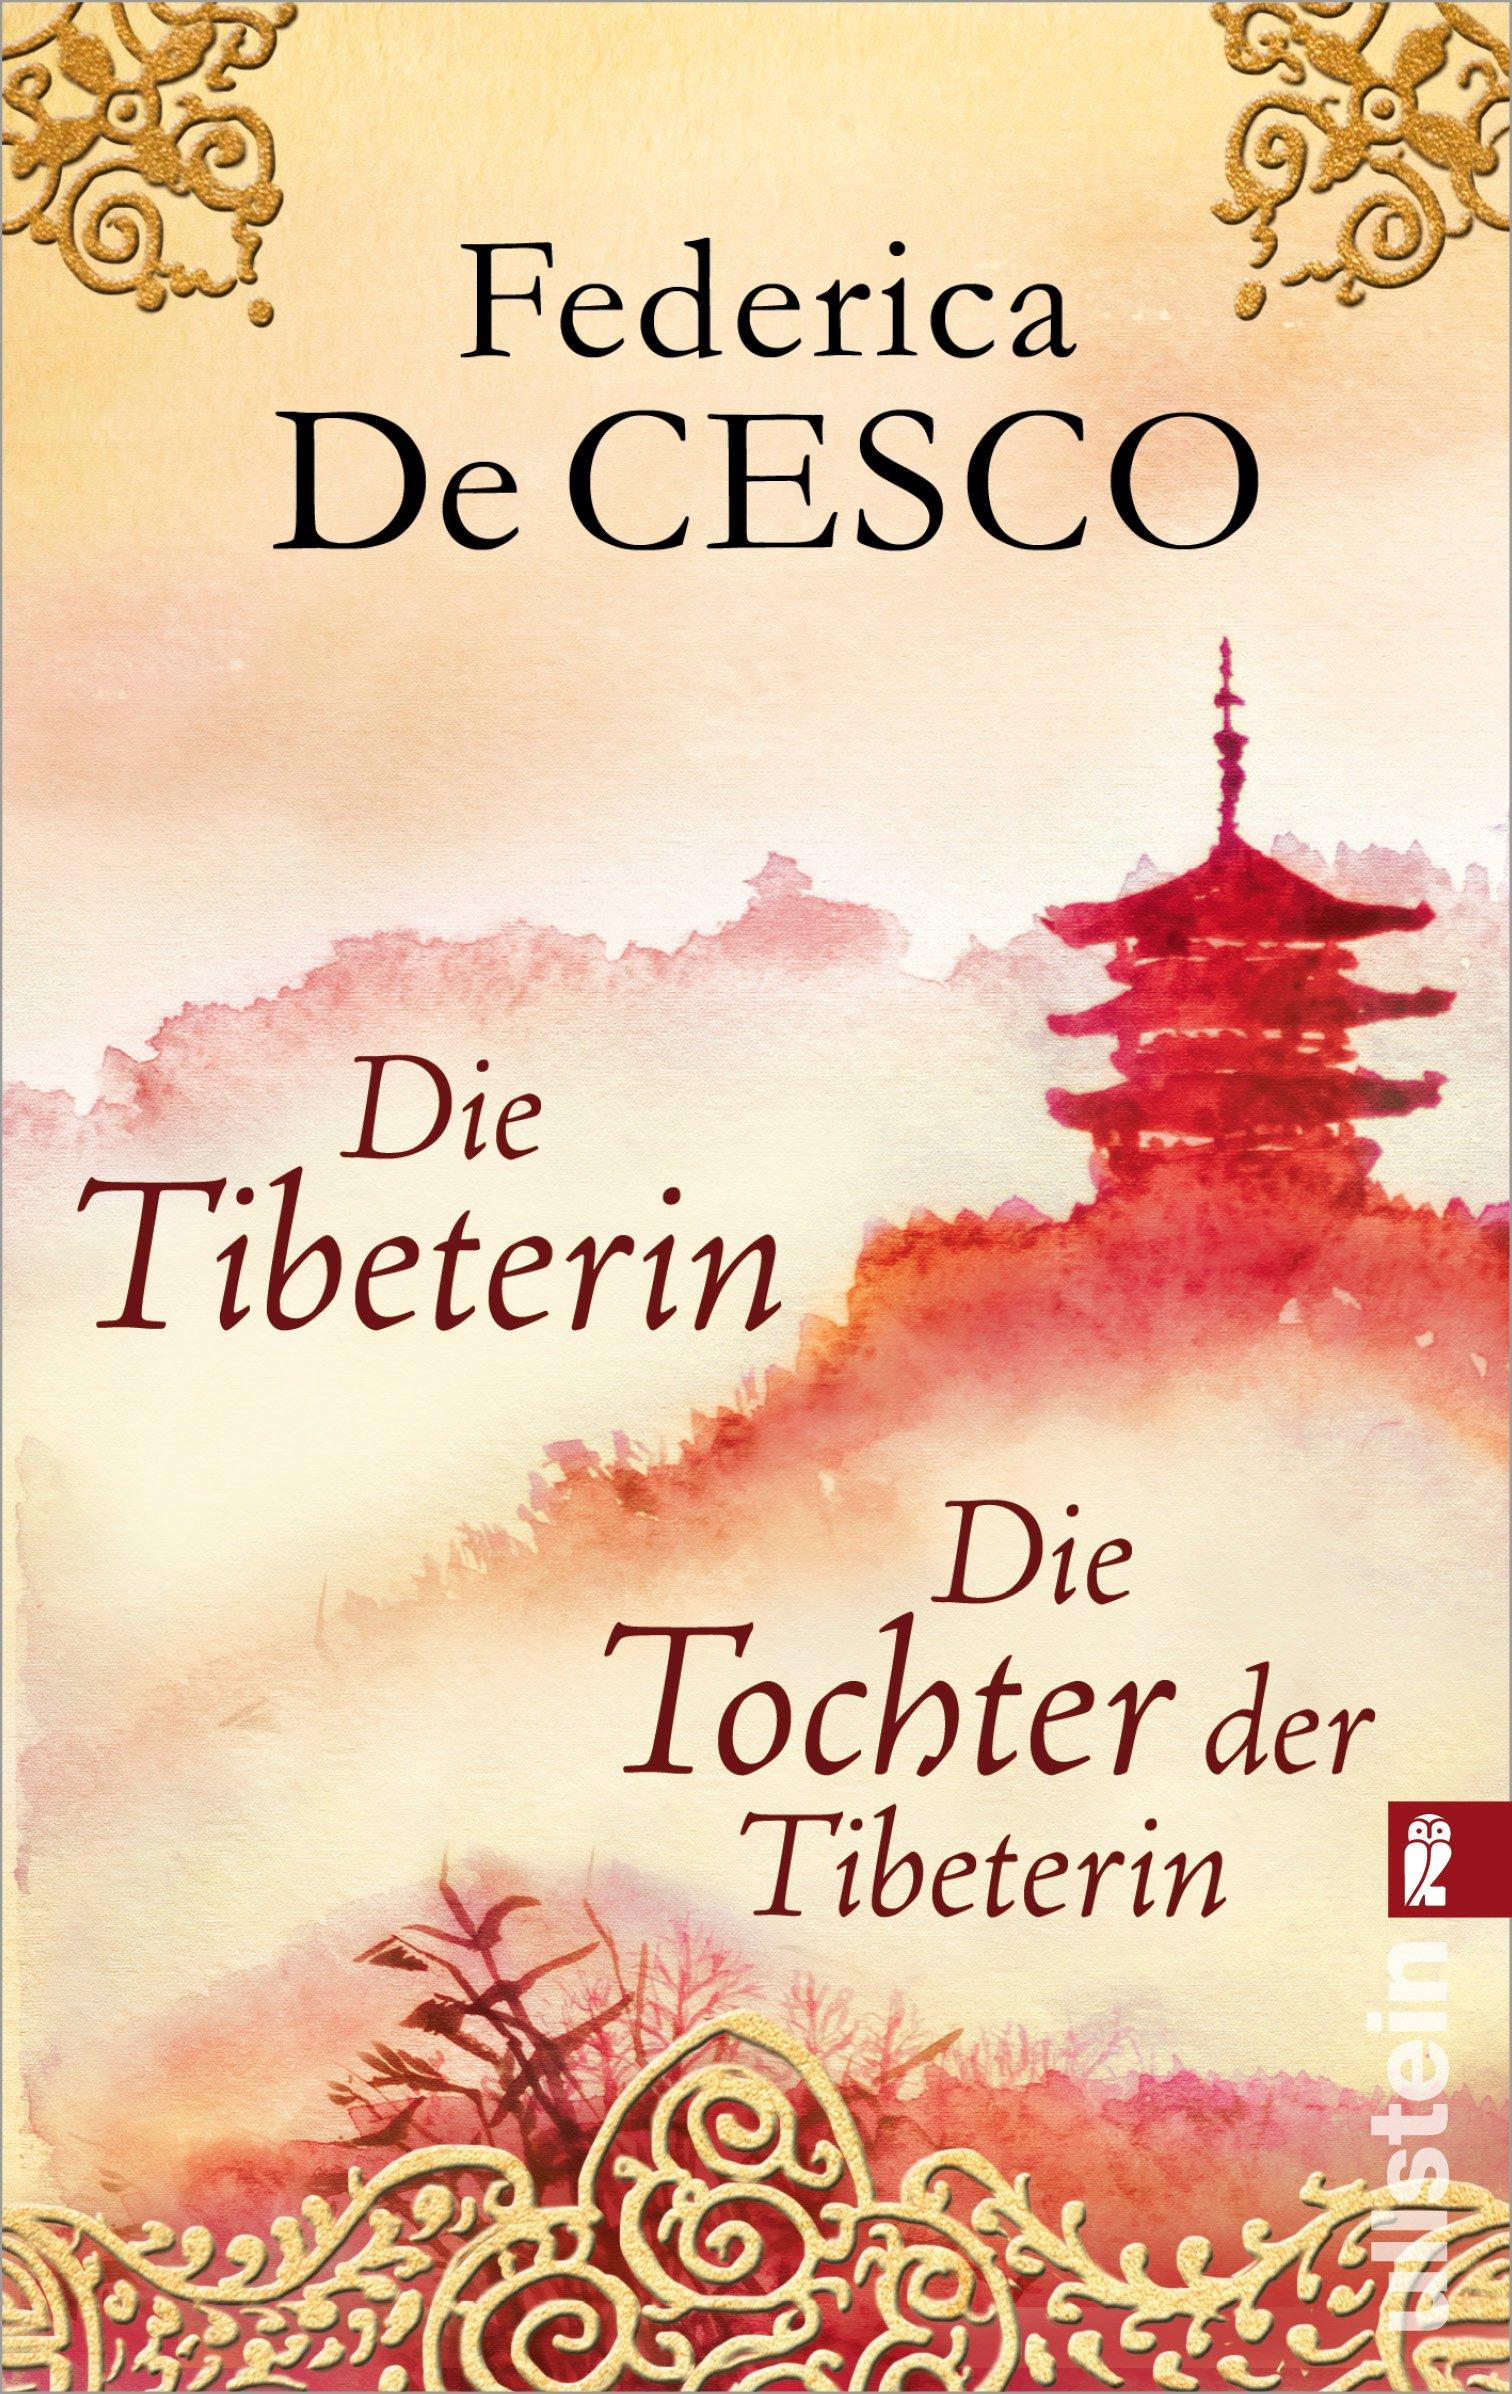 Die Tibeterin / Die Tochter der Tibeterin